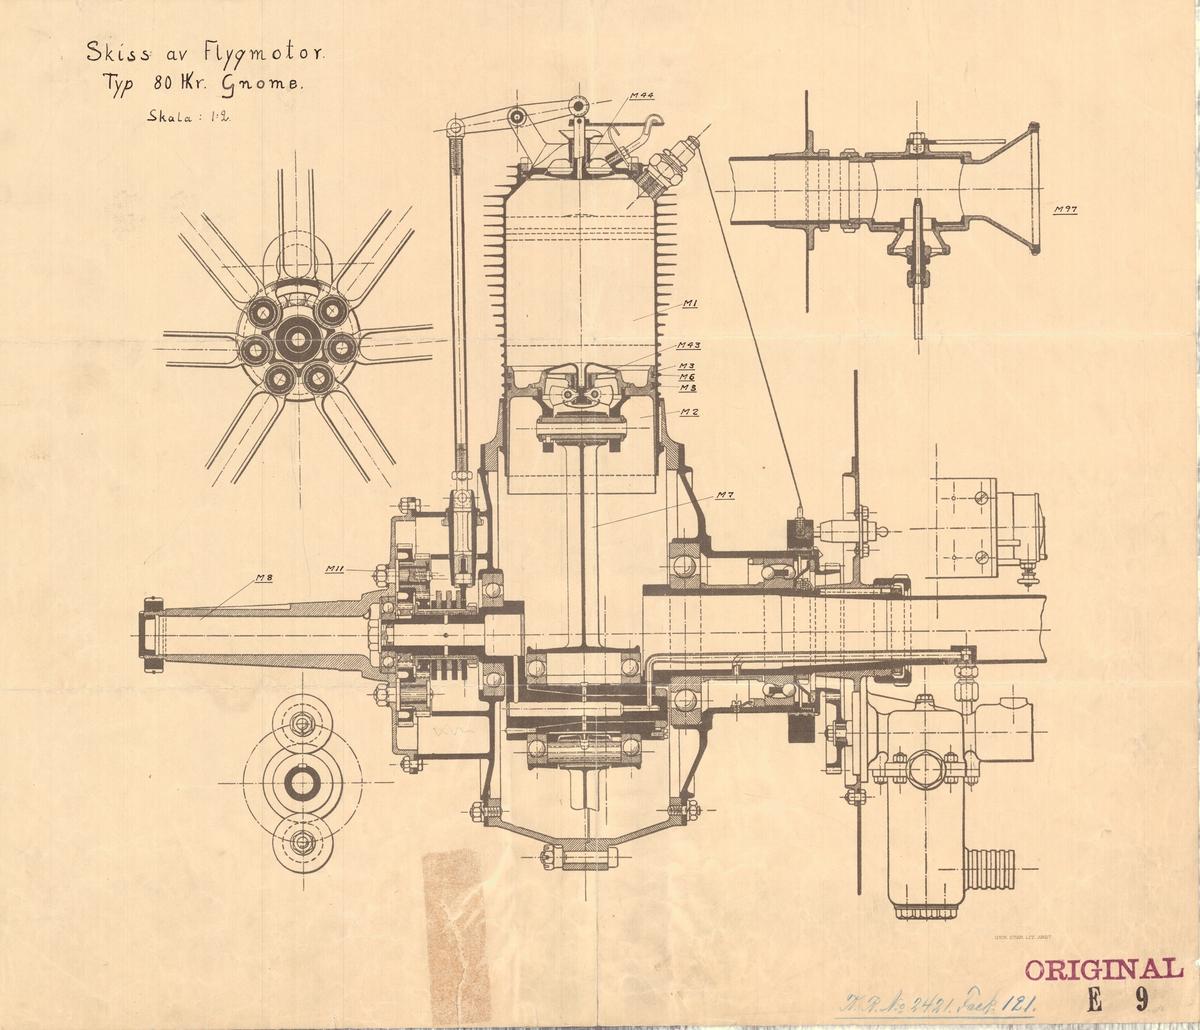 Skiss av flylgmotor, typ 80 hkr Gnome